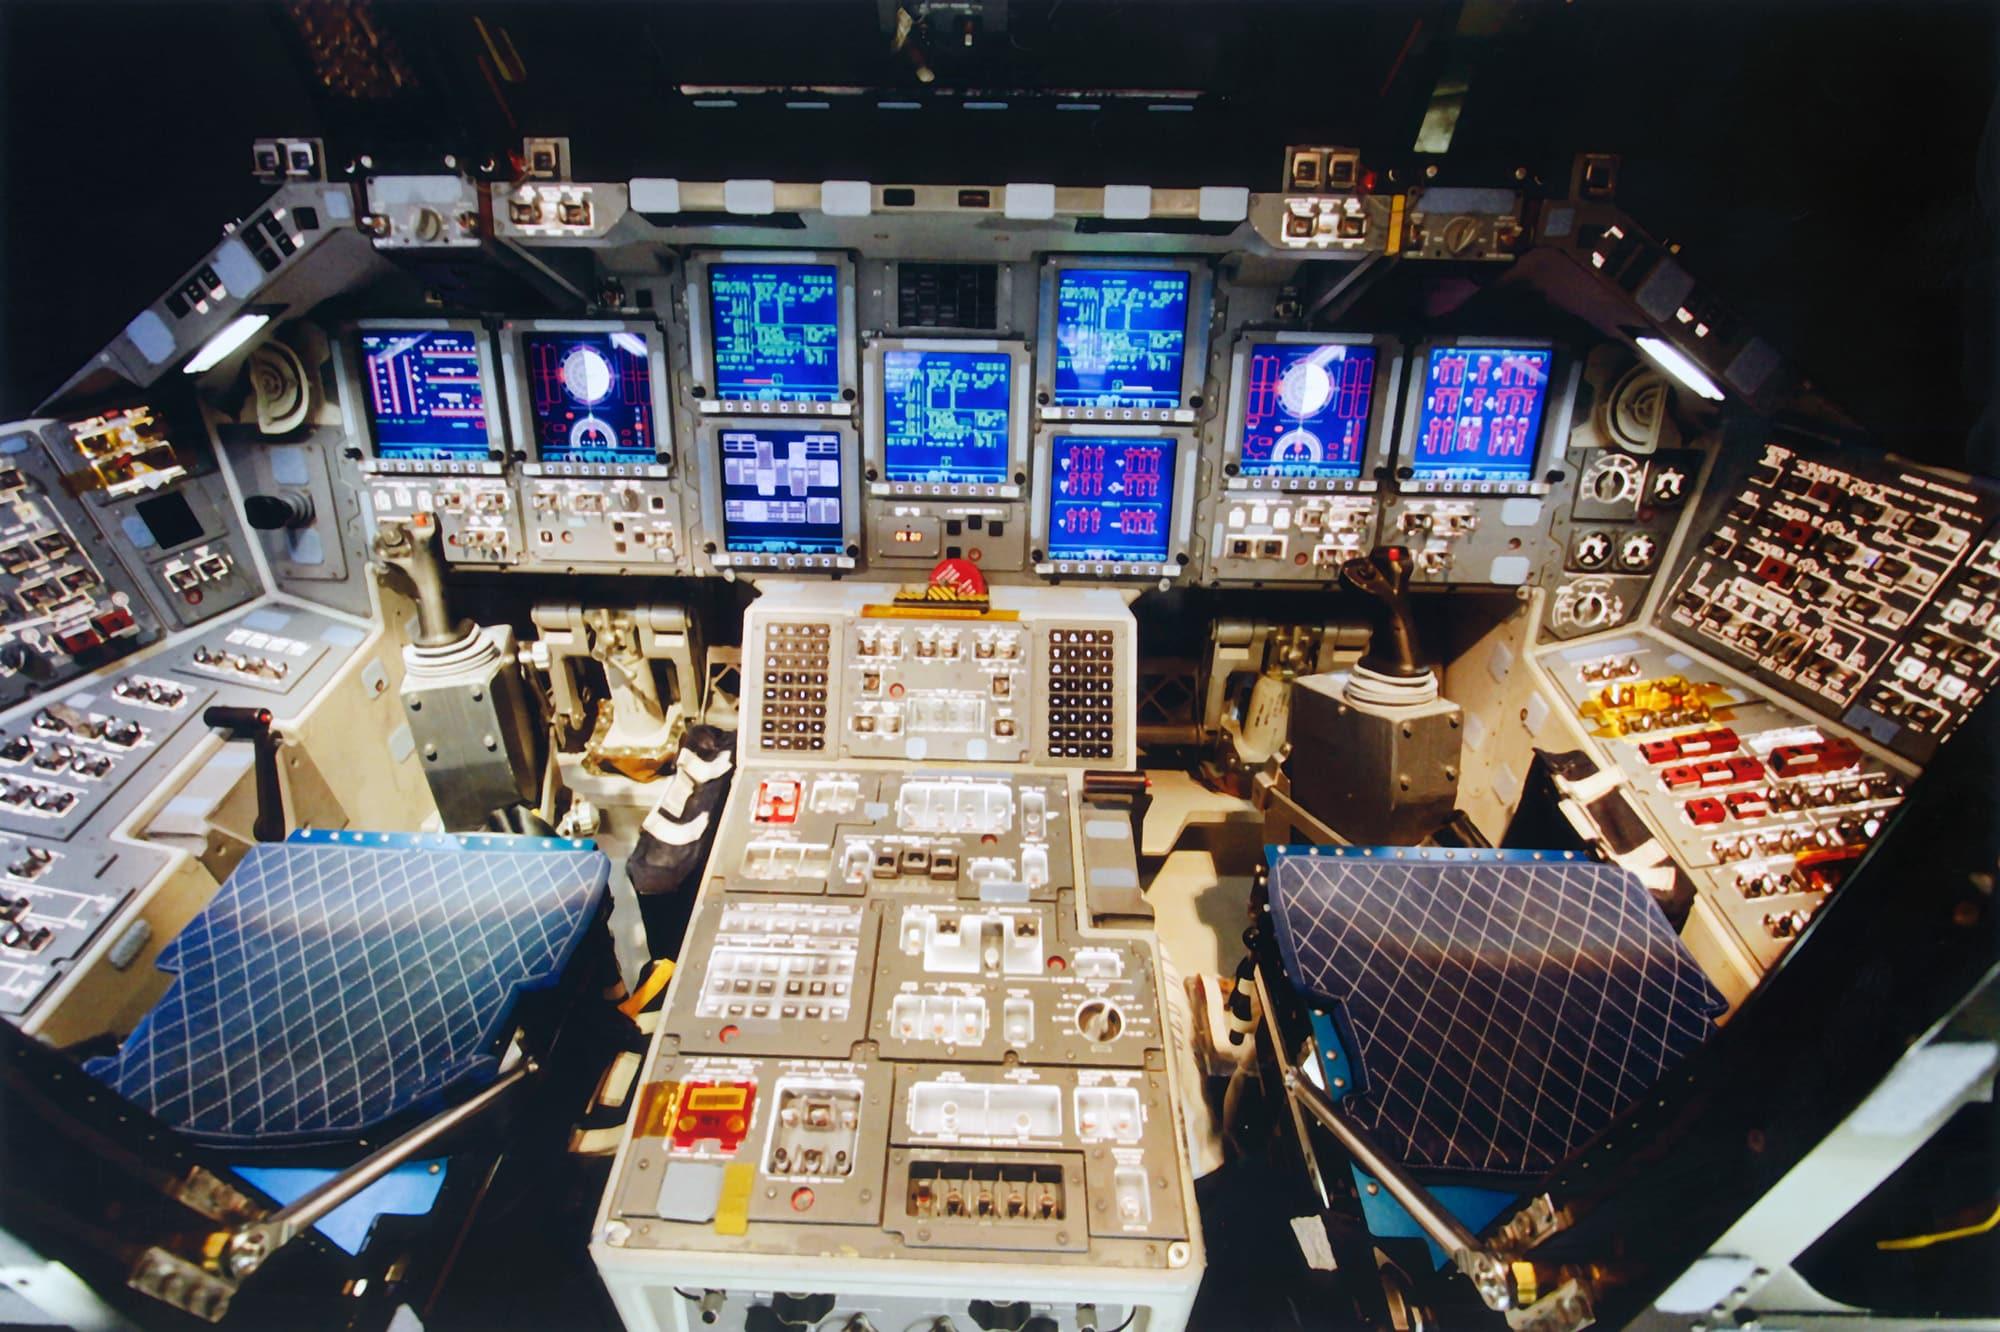 Unutrašnjost Shuttlea Discovery (Credit: NASA)